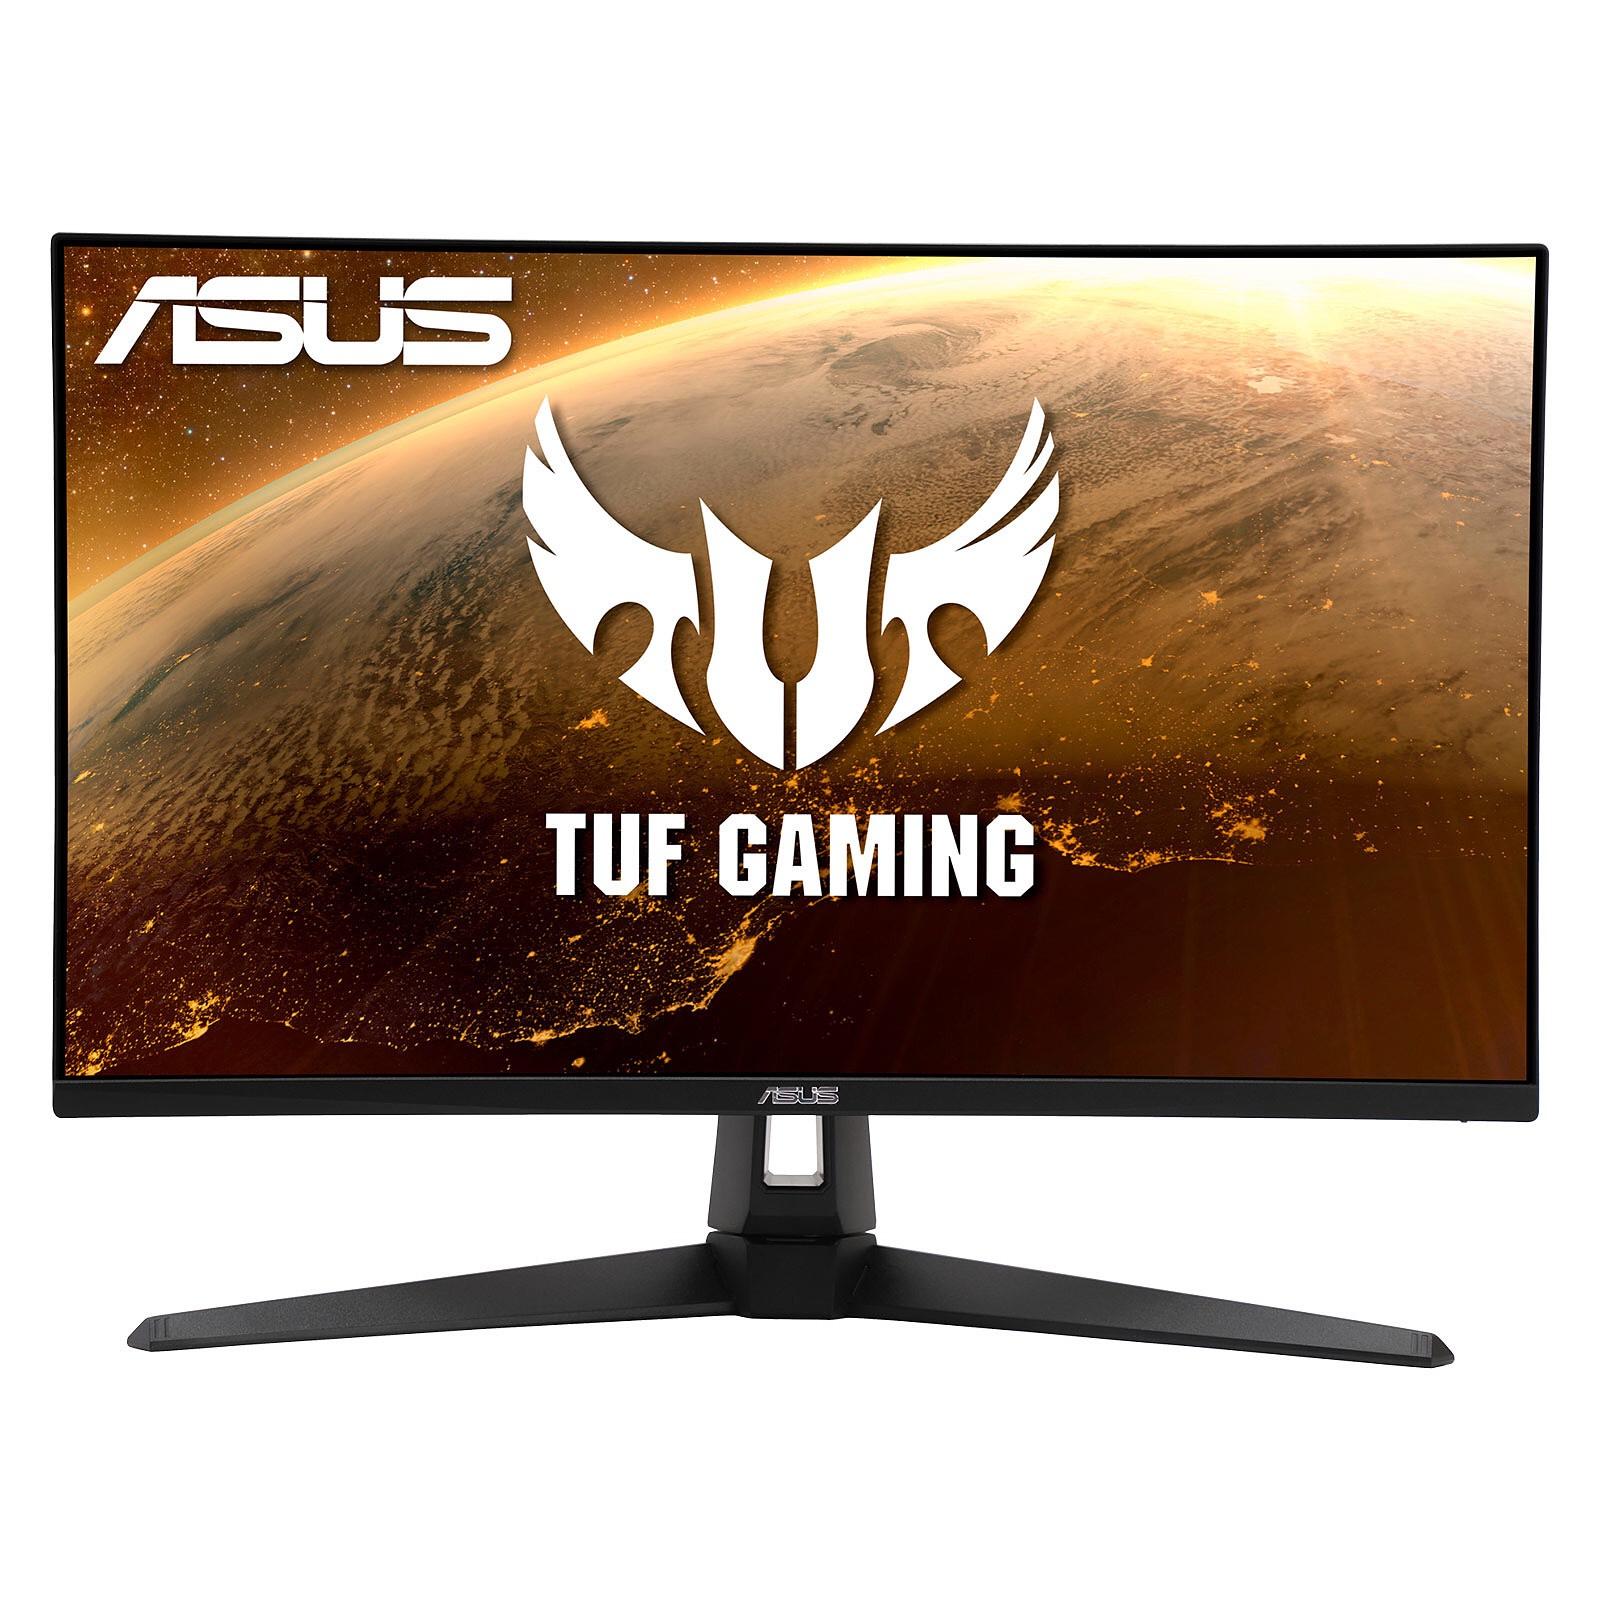 "Écran PC 27"" Asus VG27AQ1A - WQHD, IPS, 170Hz, G-Sync, HDR (+12€ en Rakuten Points - 369.99€ via RAKUTEN30)"